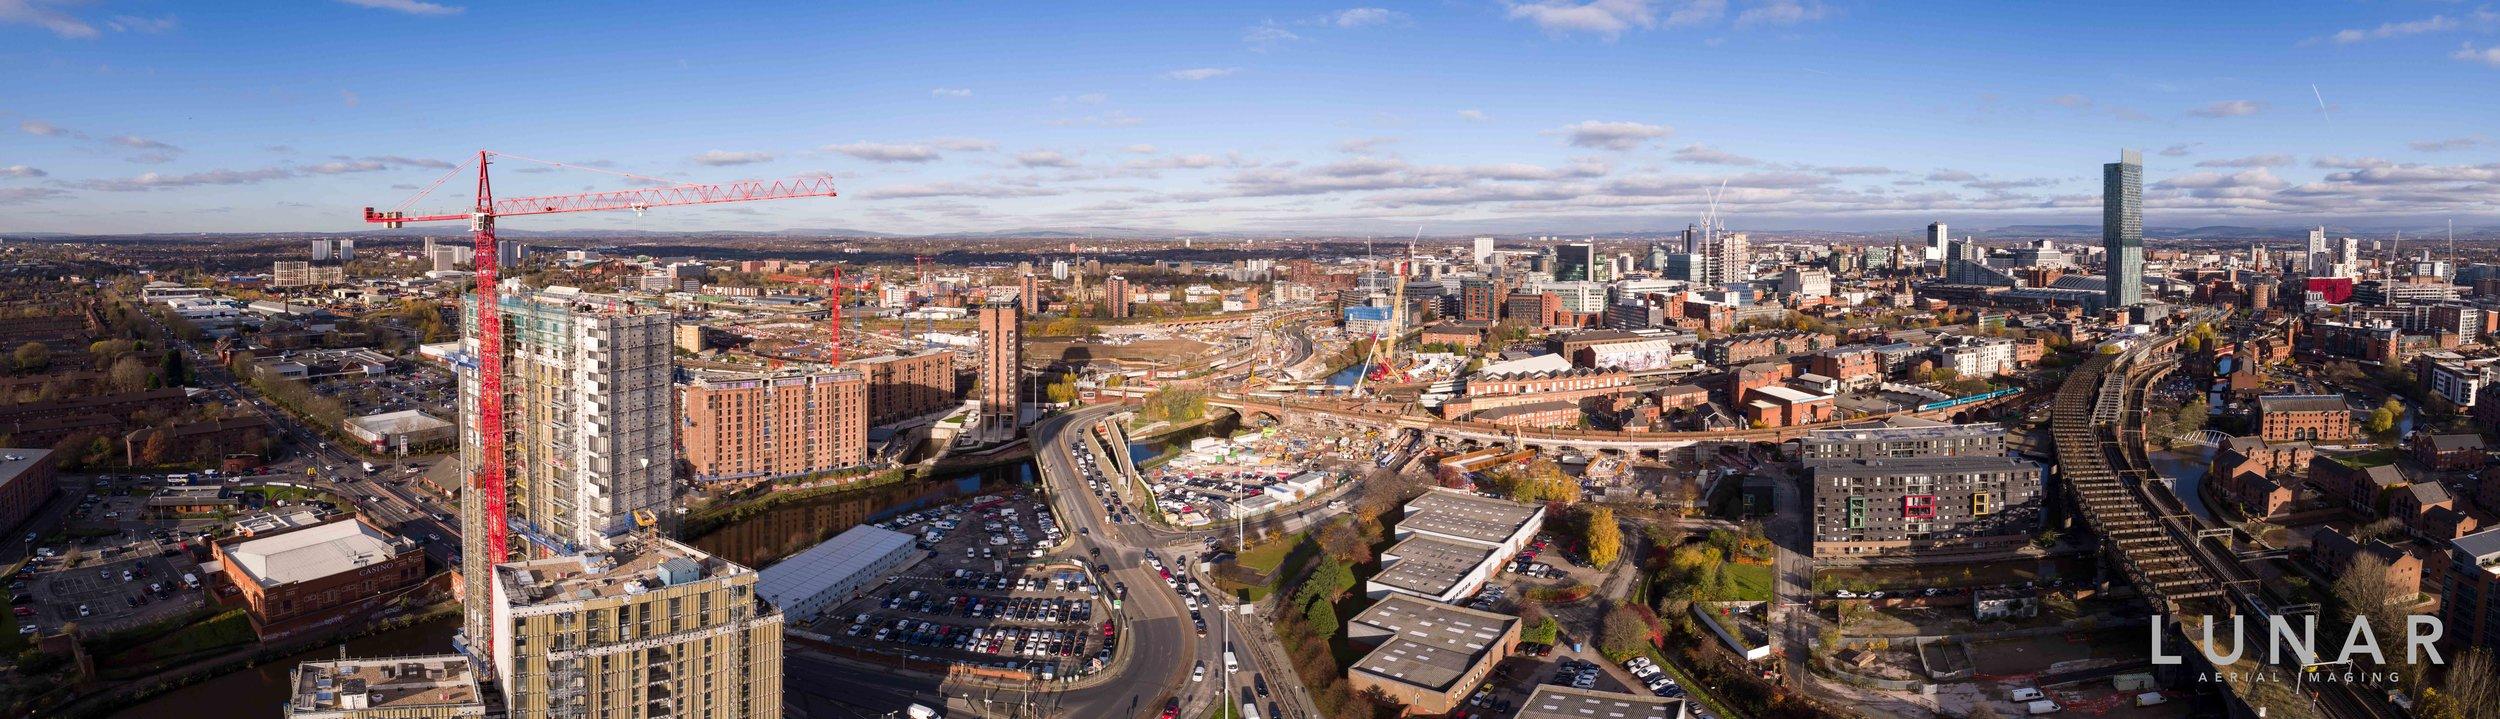 panorama drone aerial photo Manchester.jpg